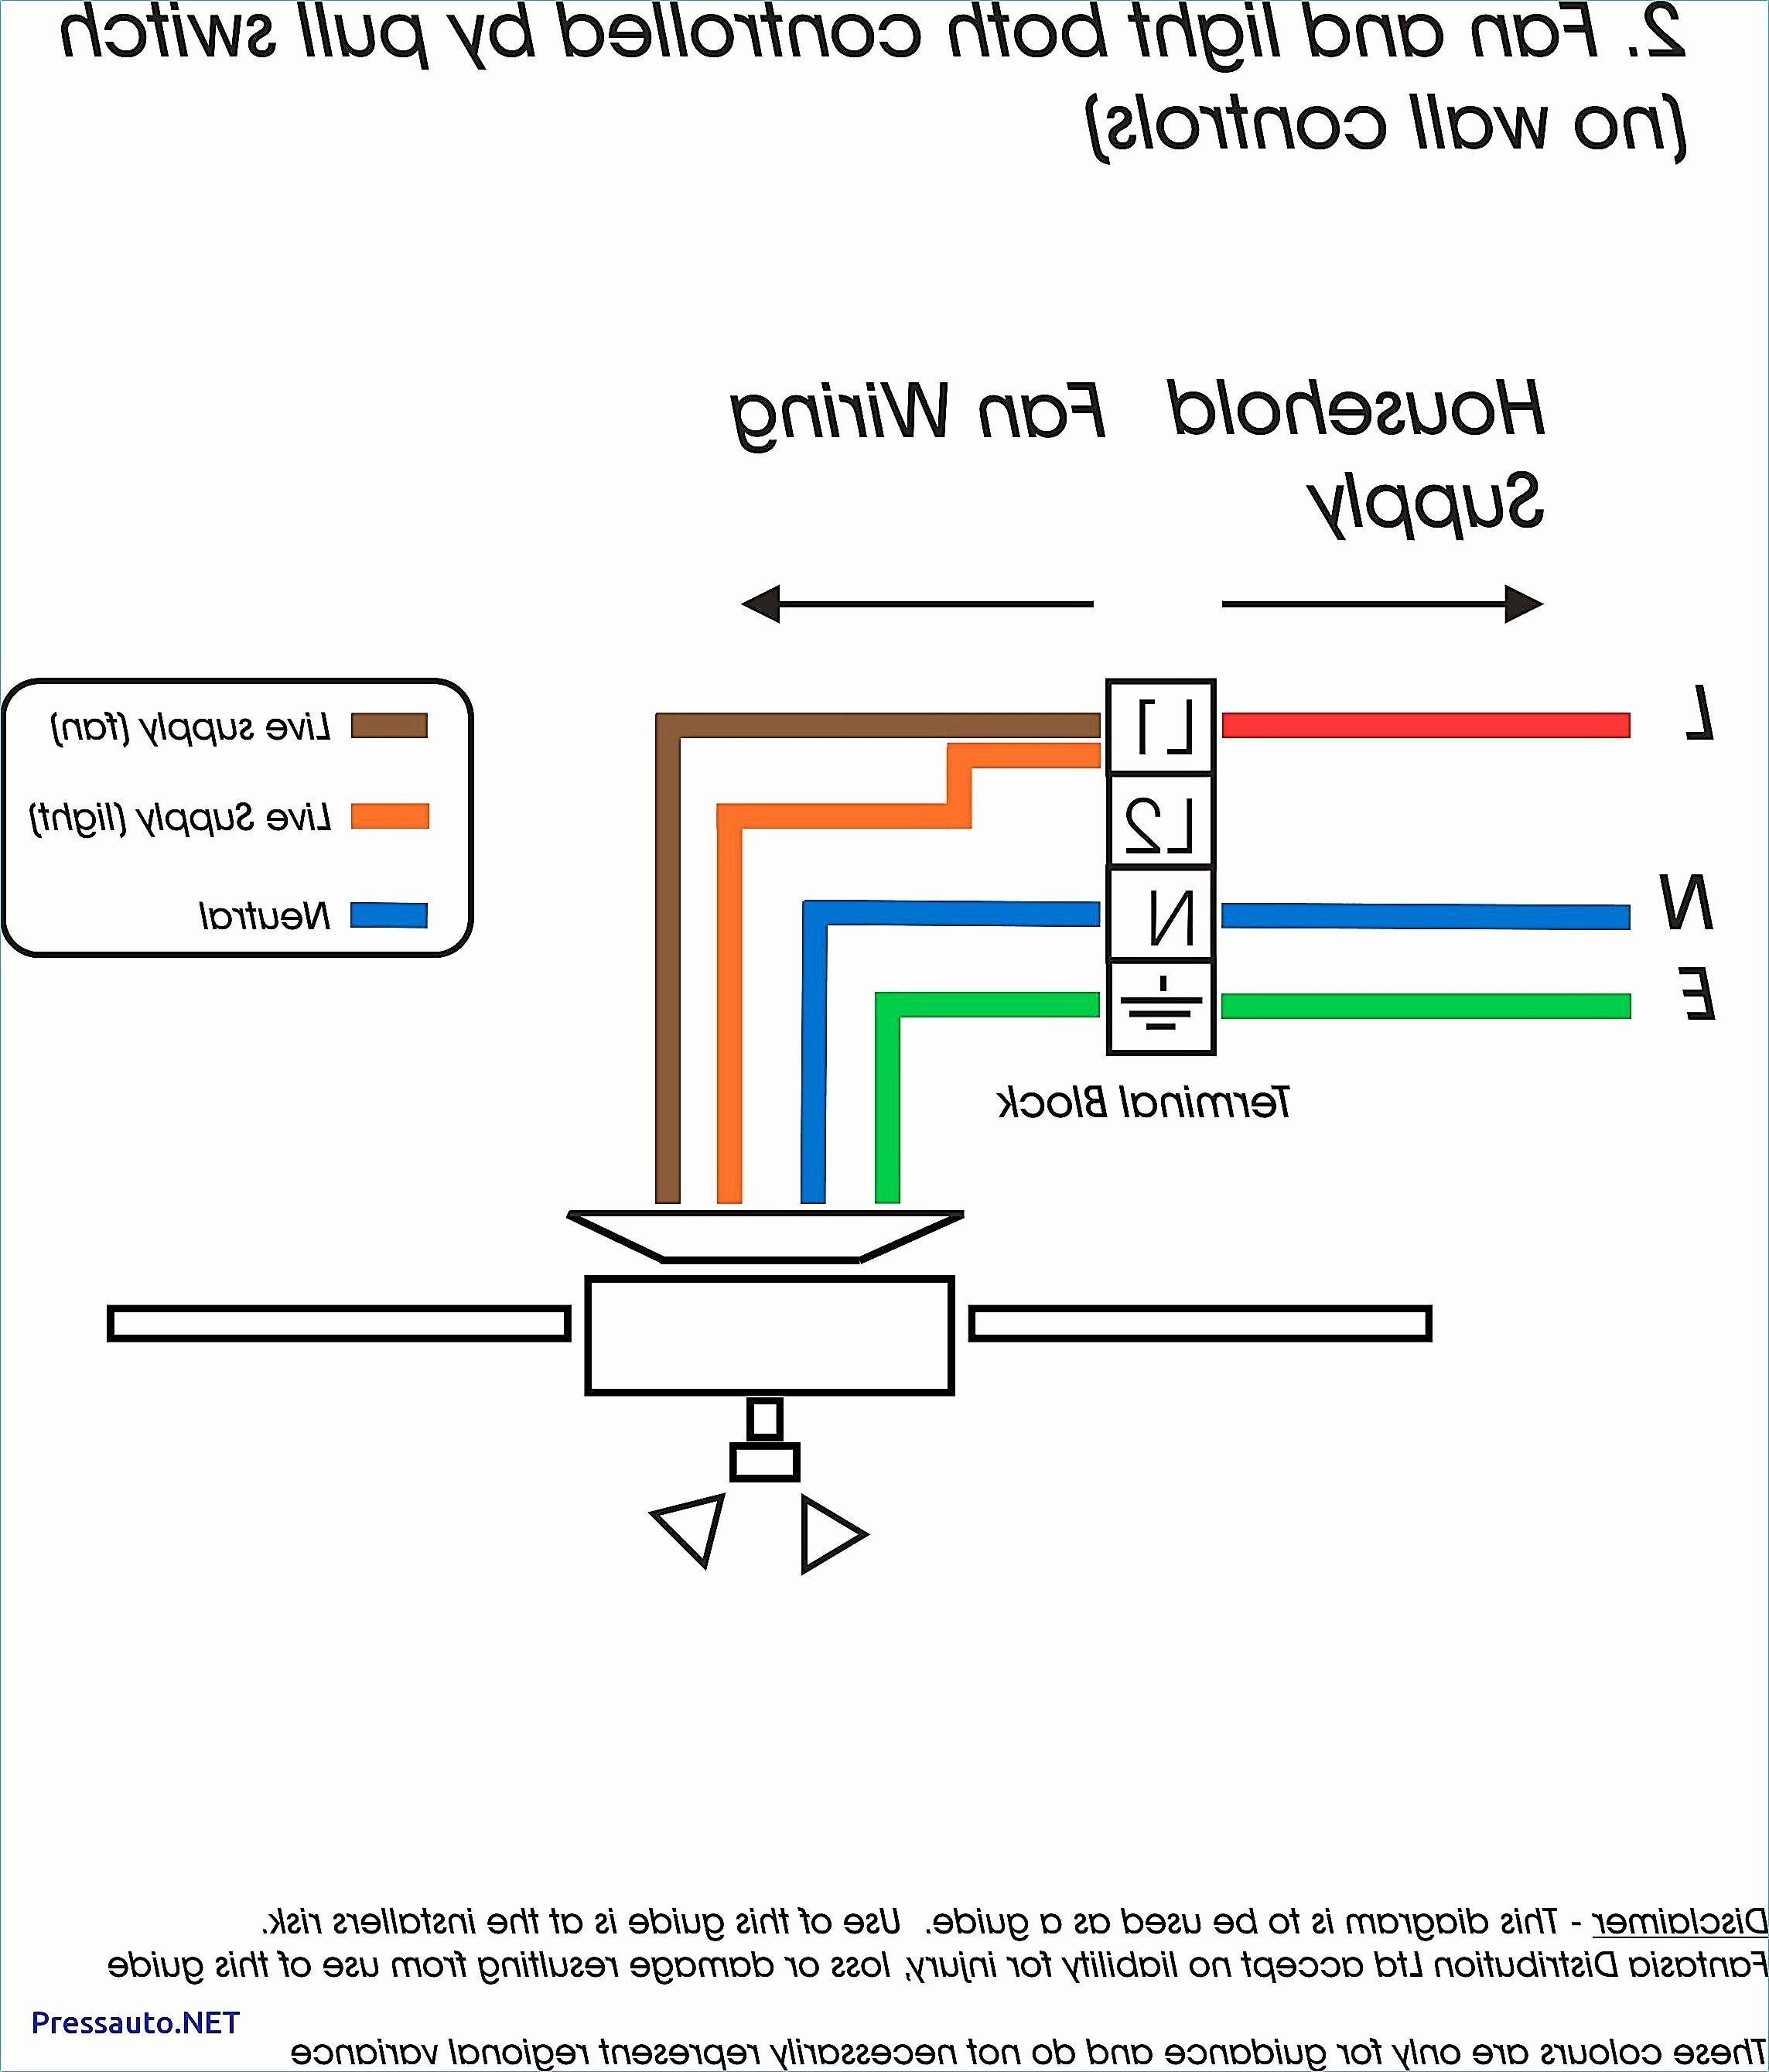 John Deere Ignition Switch Wiring Diagram 2018 Wiring Diagram - John Deere Ignition Switch Wiring Diagram